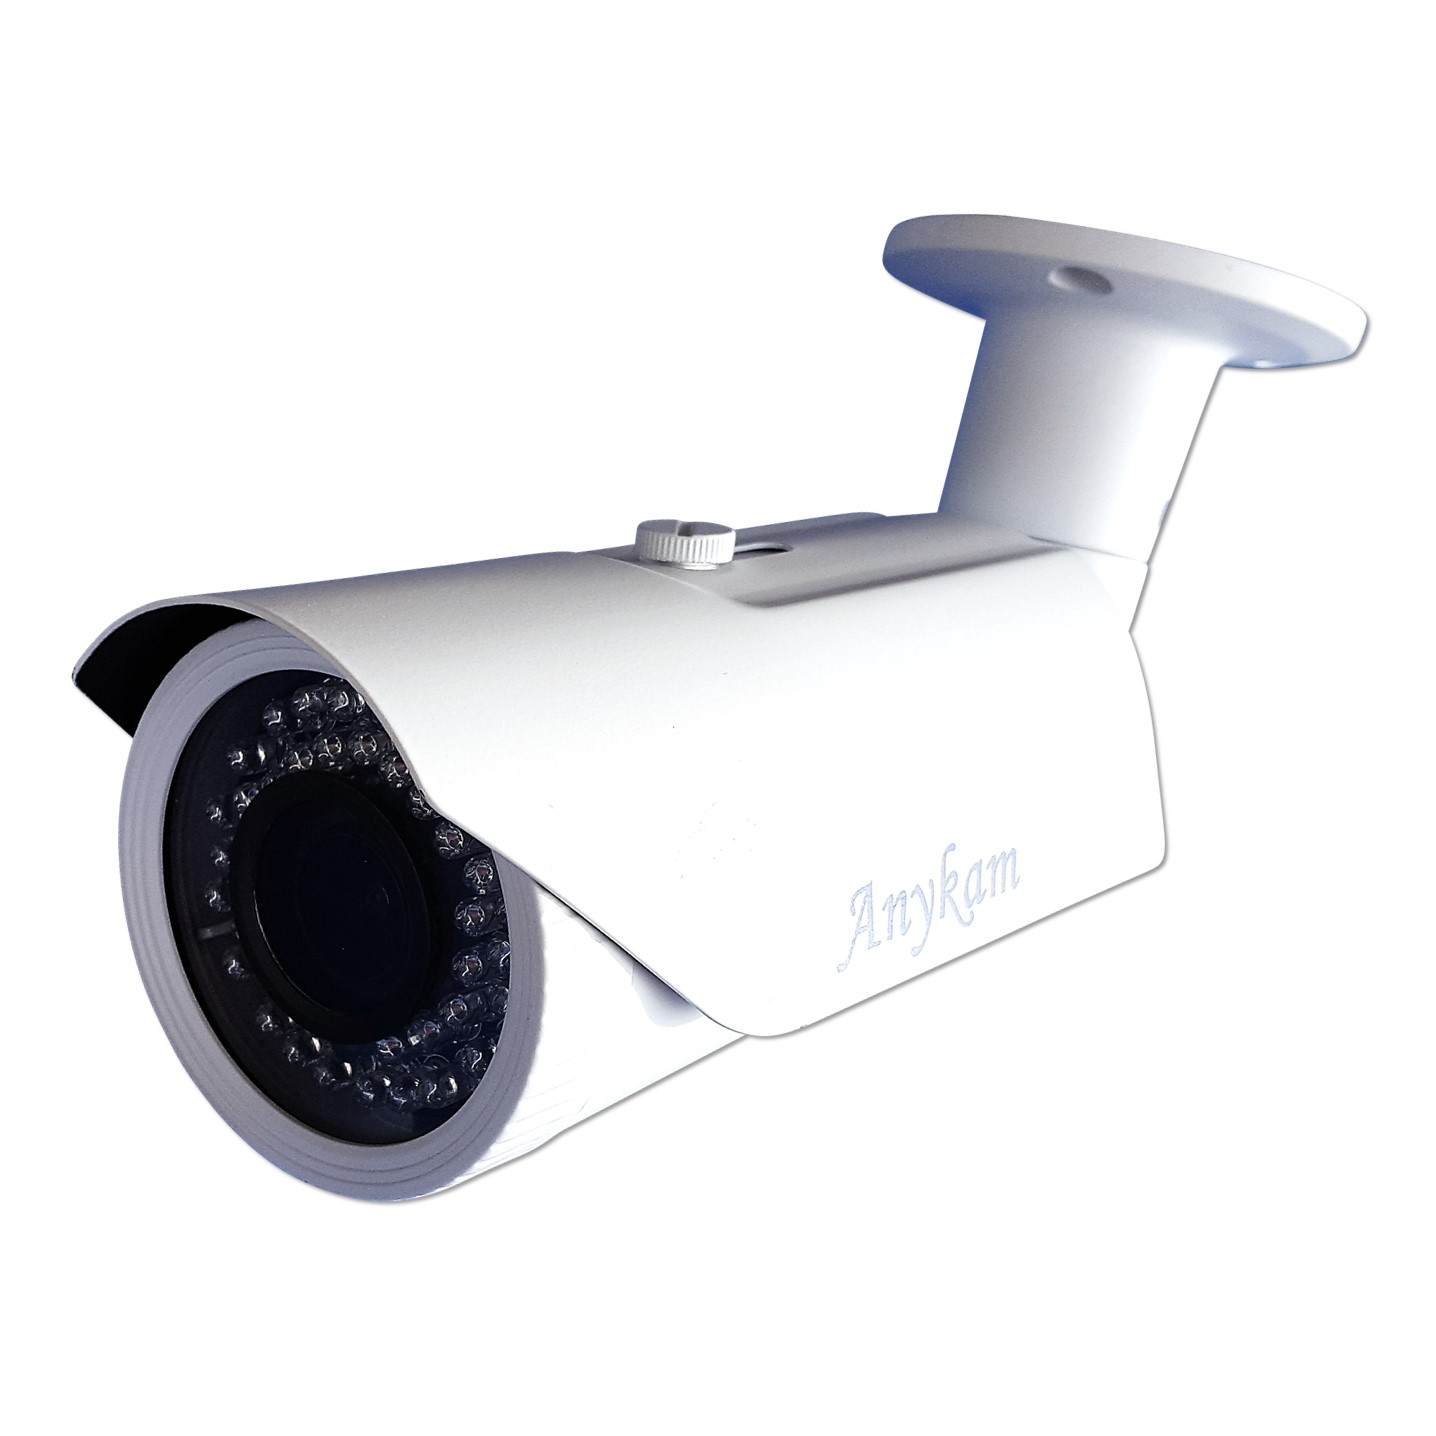 Wetterfeste Infrarot Kamera Nachtsichtkamera Megapixel Überwachungskamera Infrarotkamera Outdoorcamera bei anykam